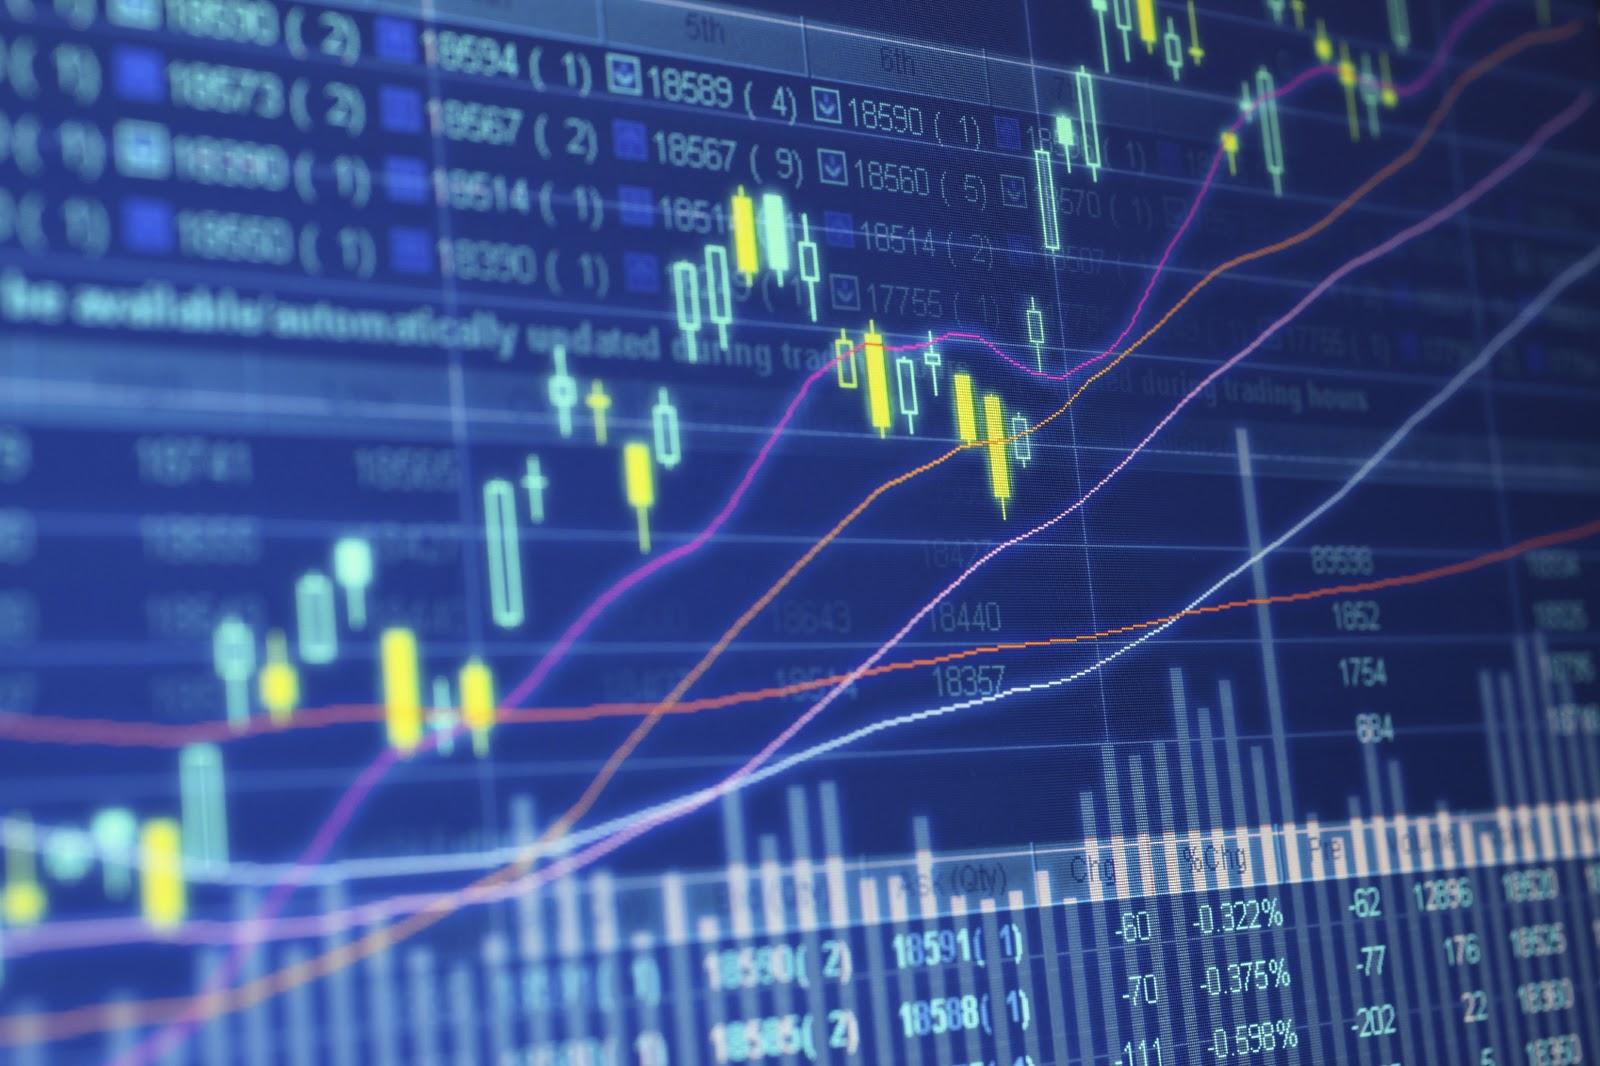 Migliori broker forex: lista broker regolamentati [2021]